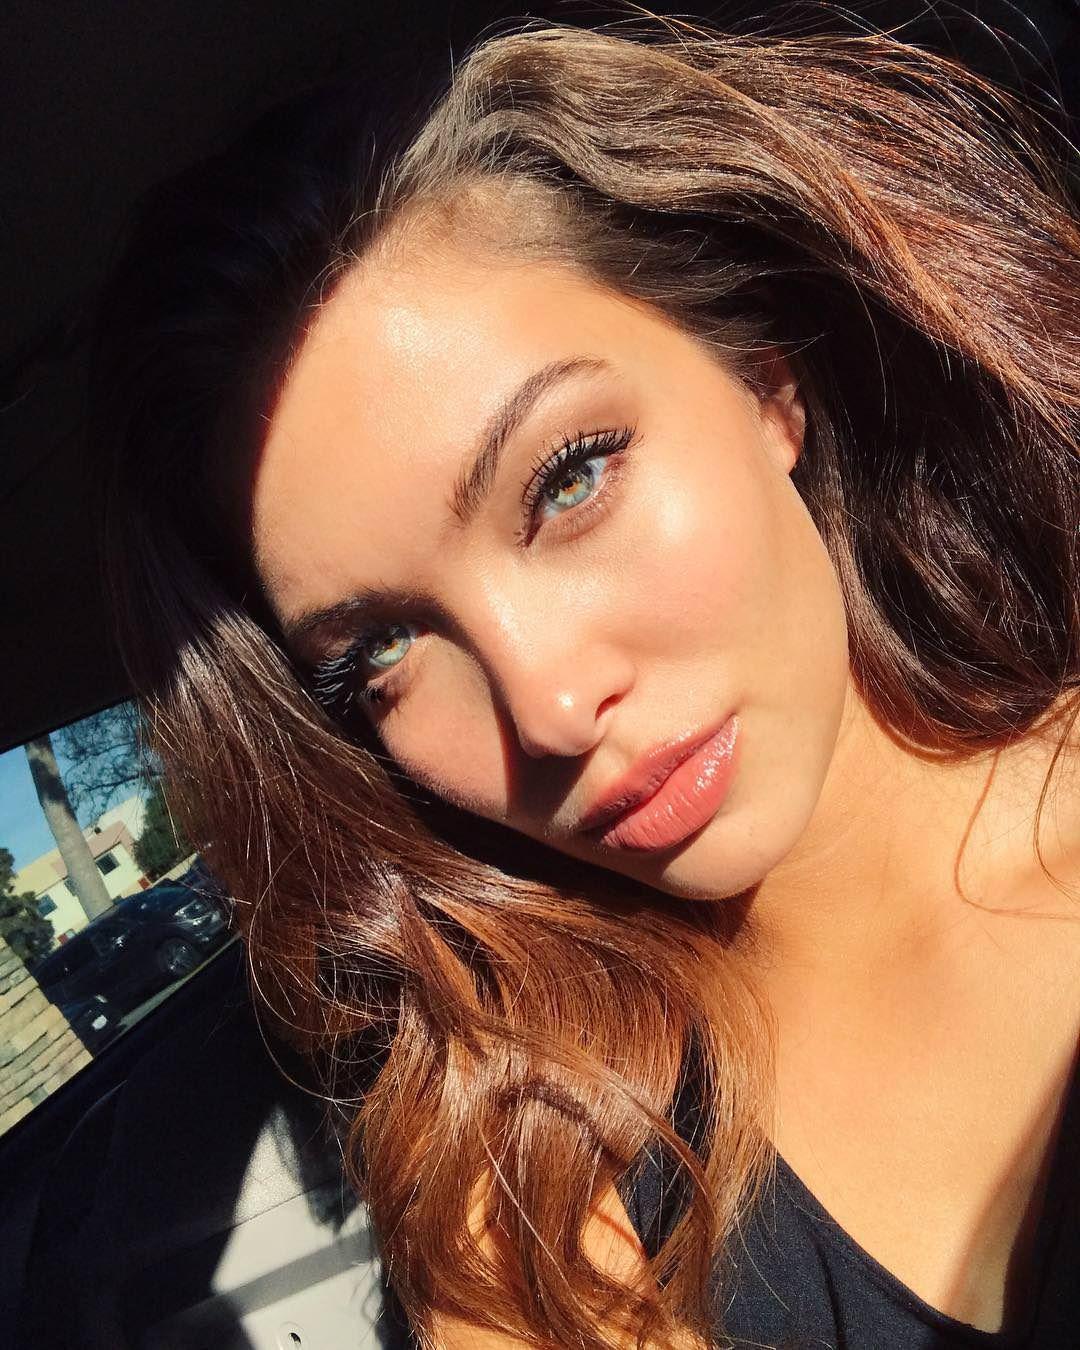 Porno Selfie Britt Rafuson  nude (74 fotos), Twitter, lingerie